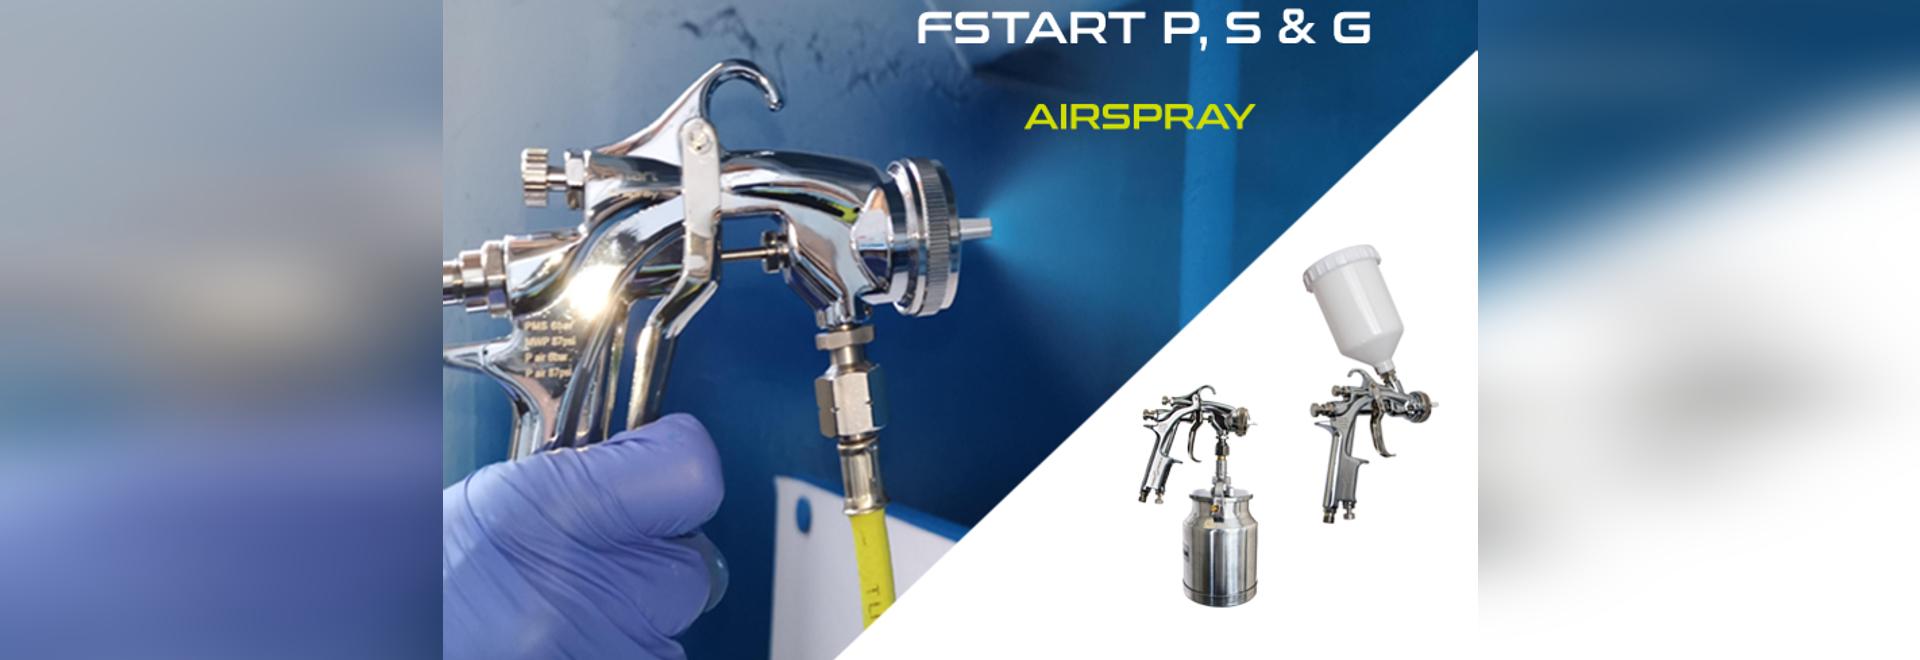 Discover the new complete Fstart spray gun range